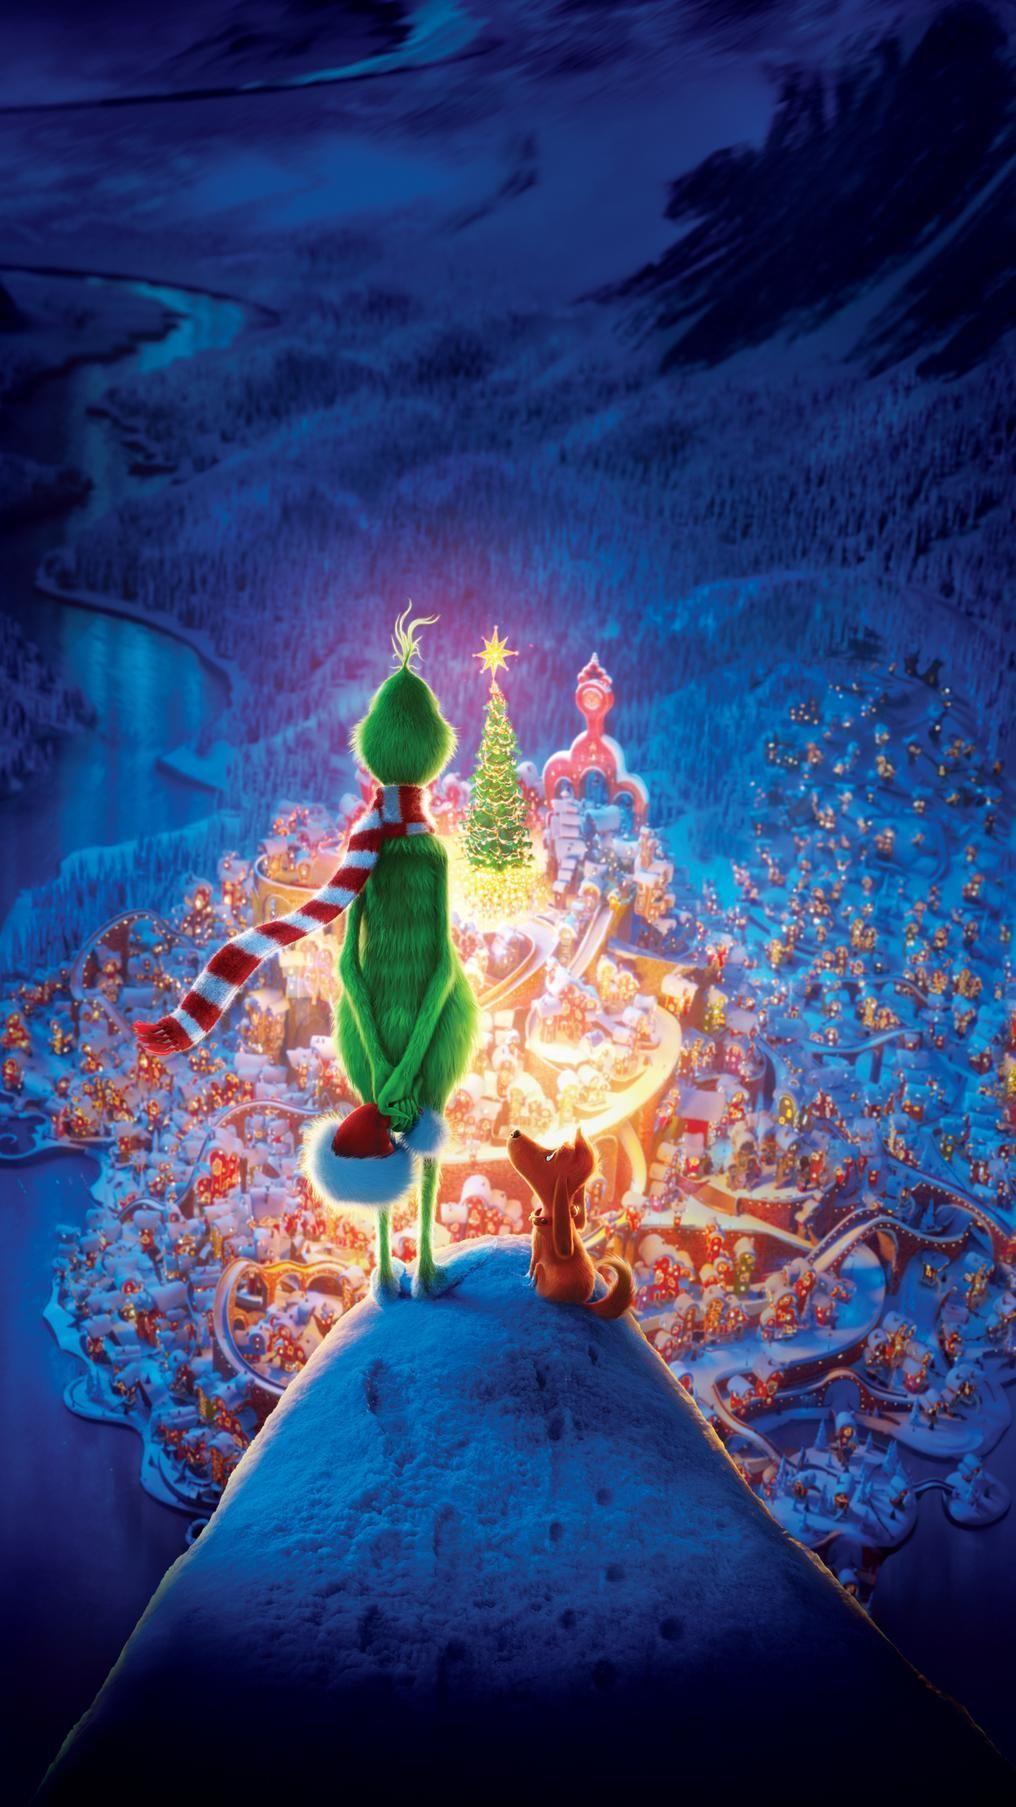 The Grinch (2018) Phone Wallpaper Moviemania Christmas